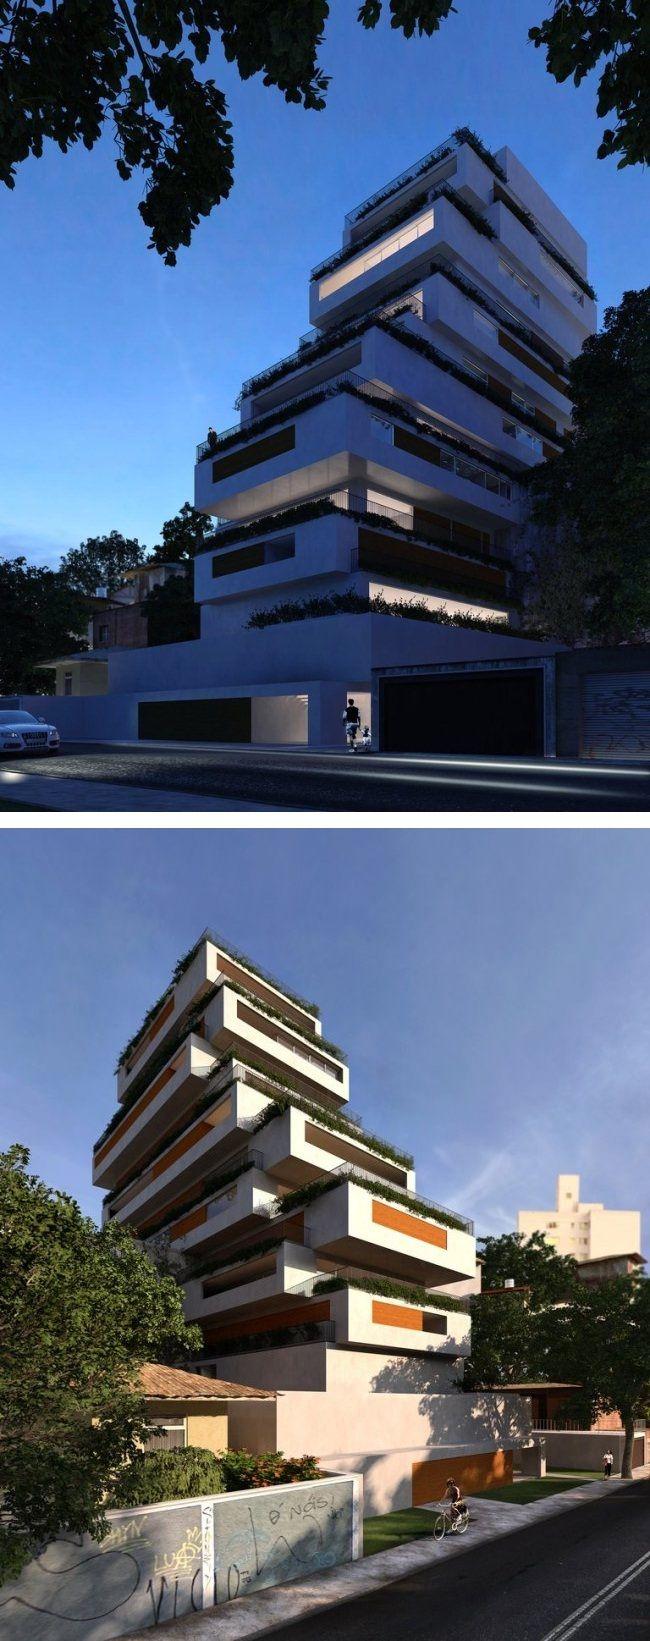 Edif cio oka rua girassol vila madalena arquiteto isay weinfeld